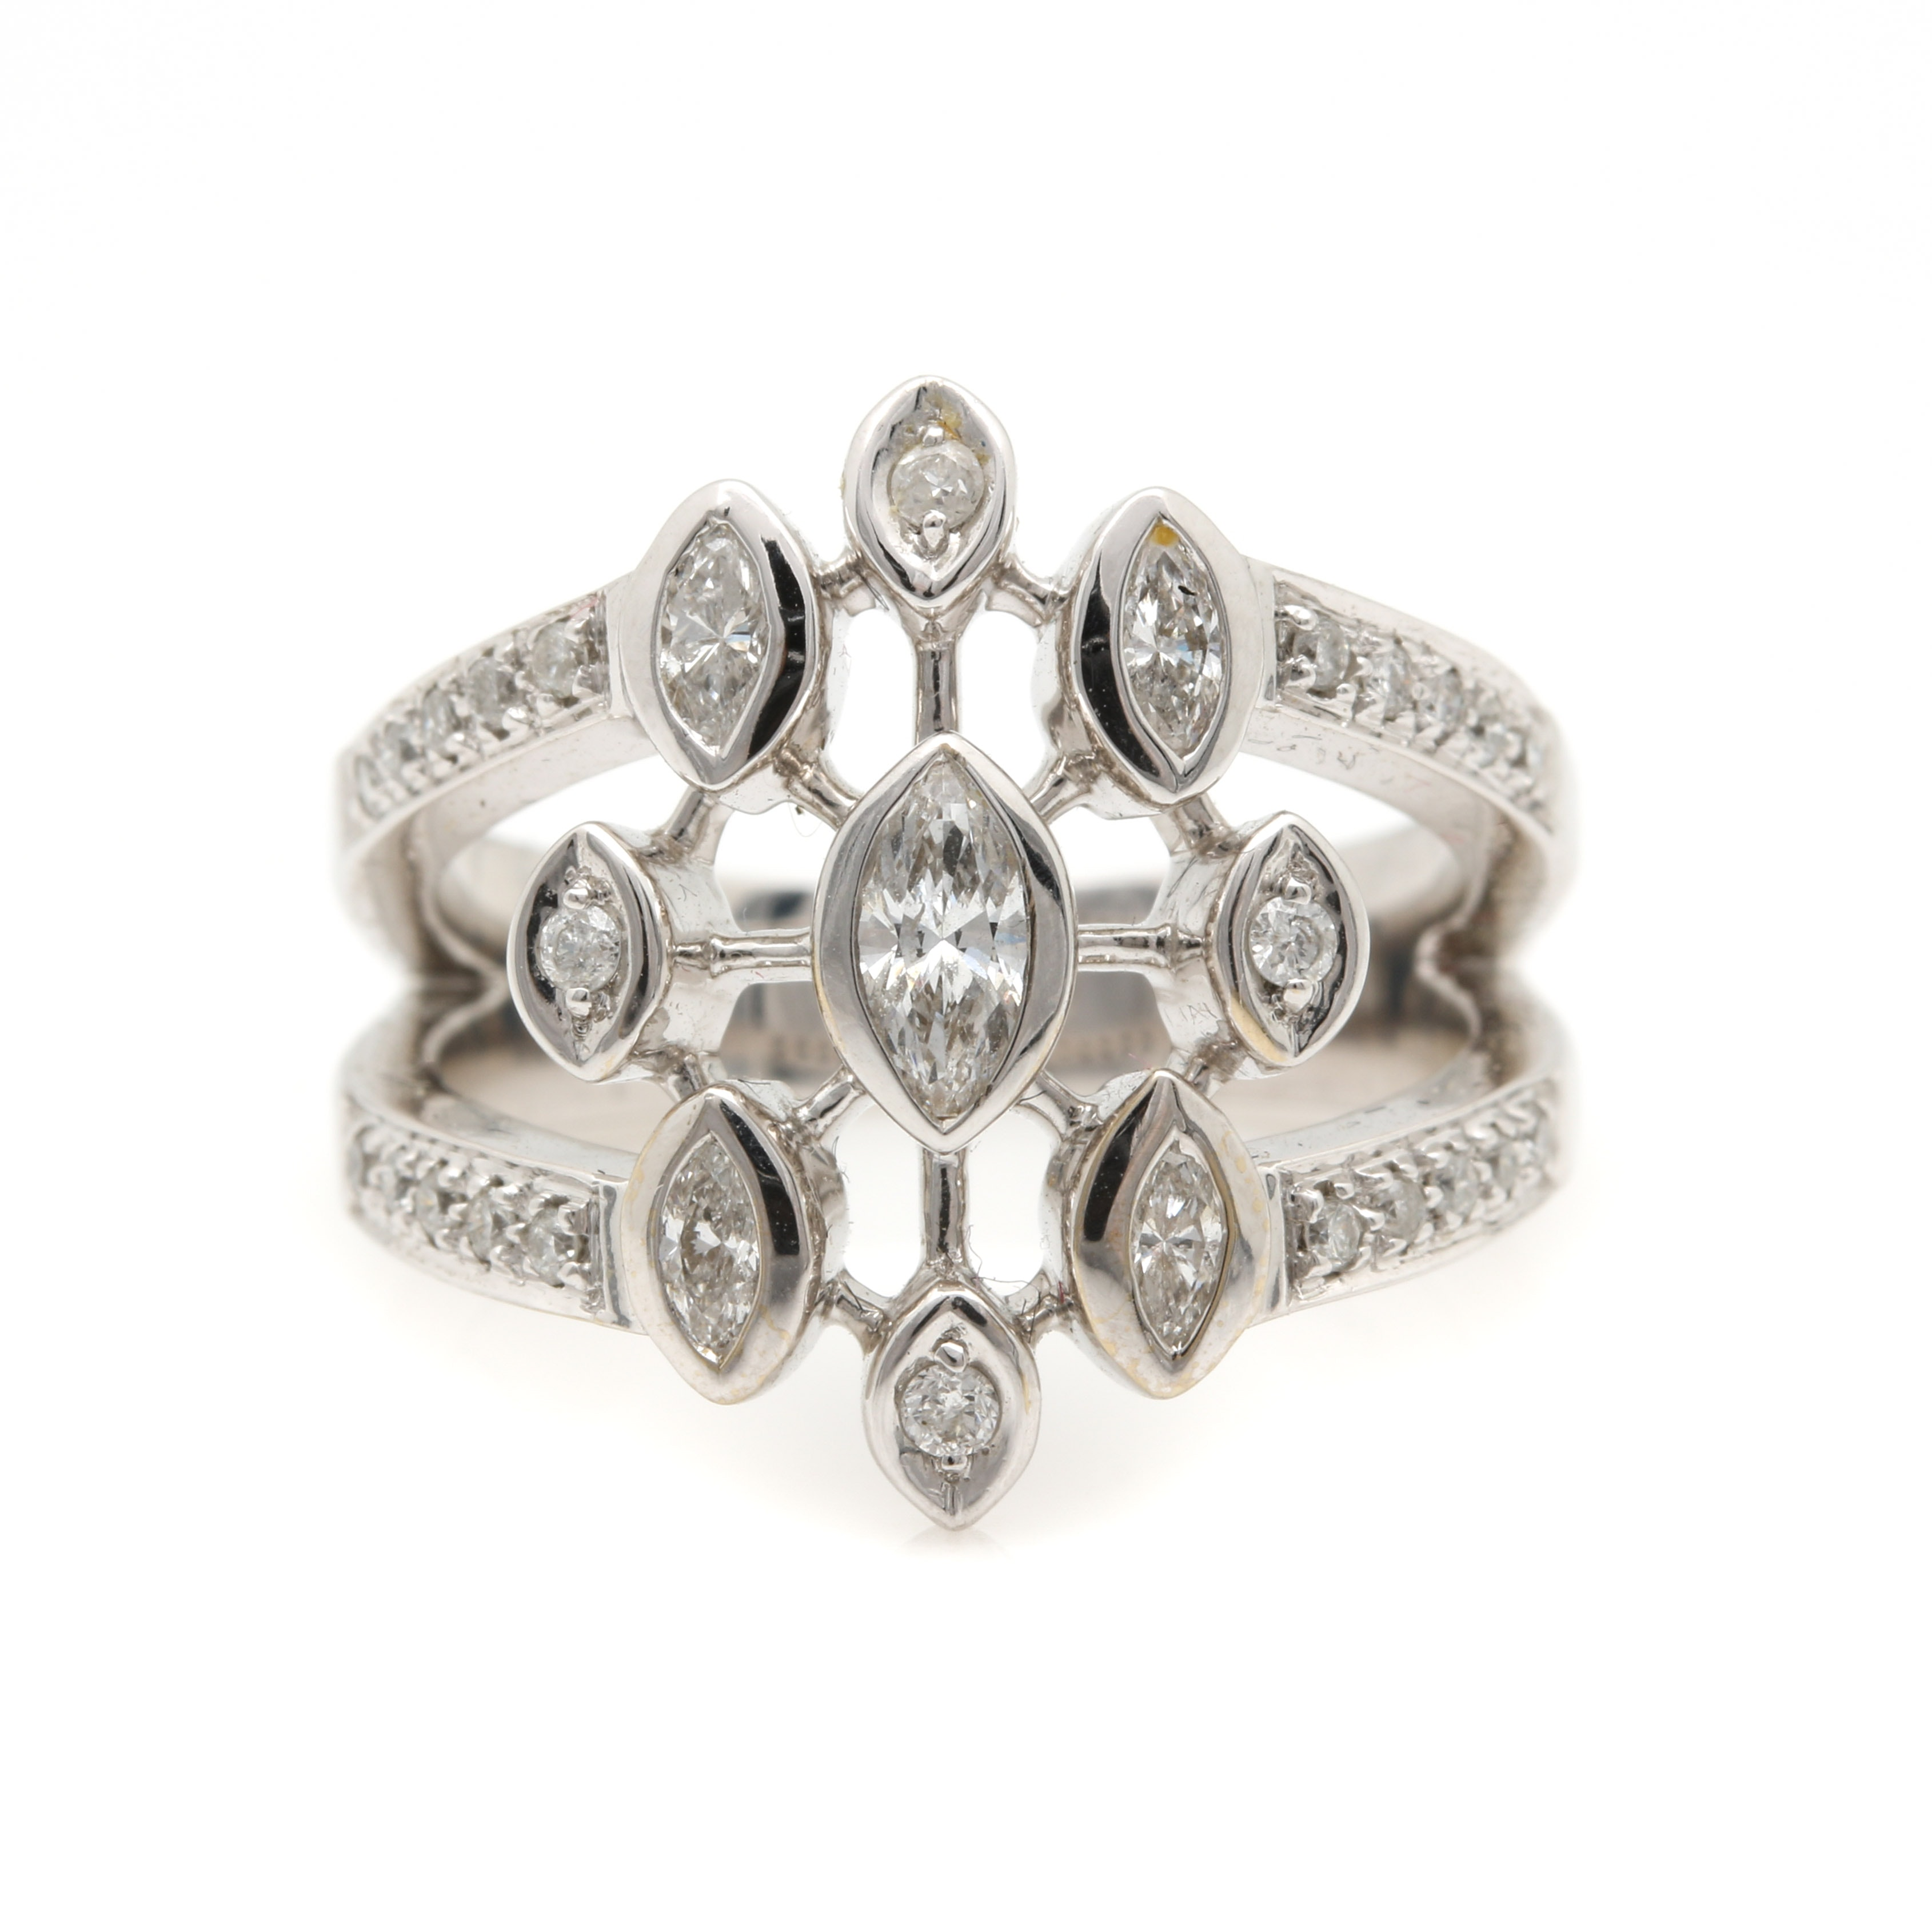 14K White Gold 0.90 CTW Diamond Ring